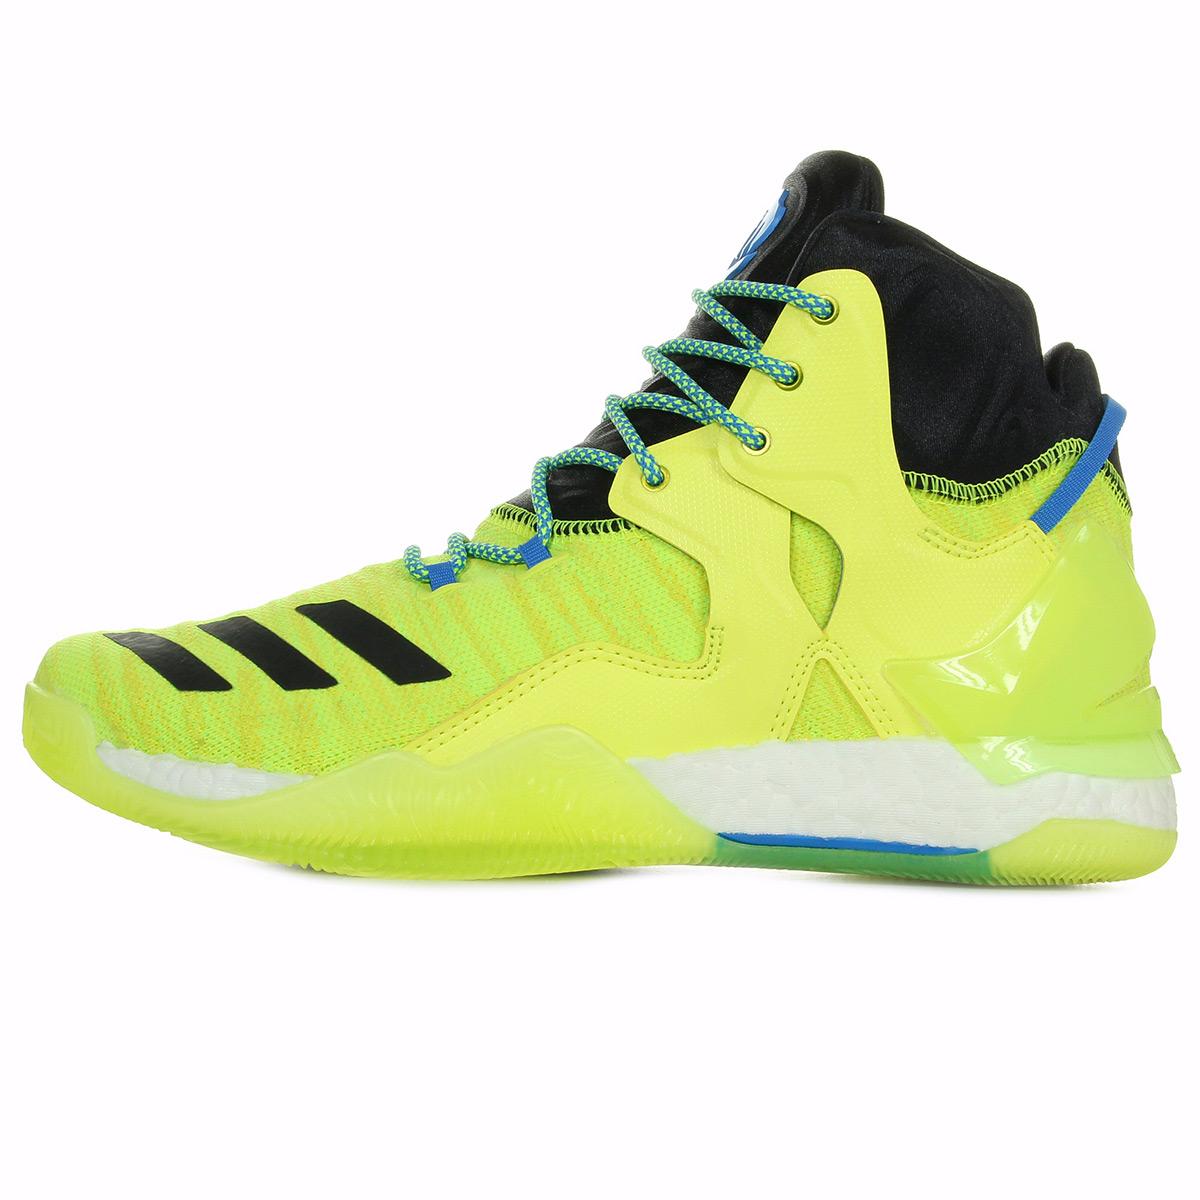 adidas Performance D Rose 7 Primeknit AQ7215, Basketball homme